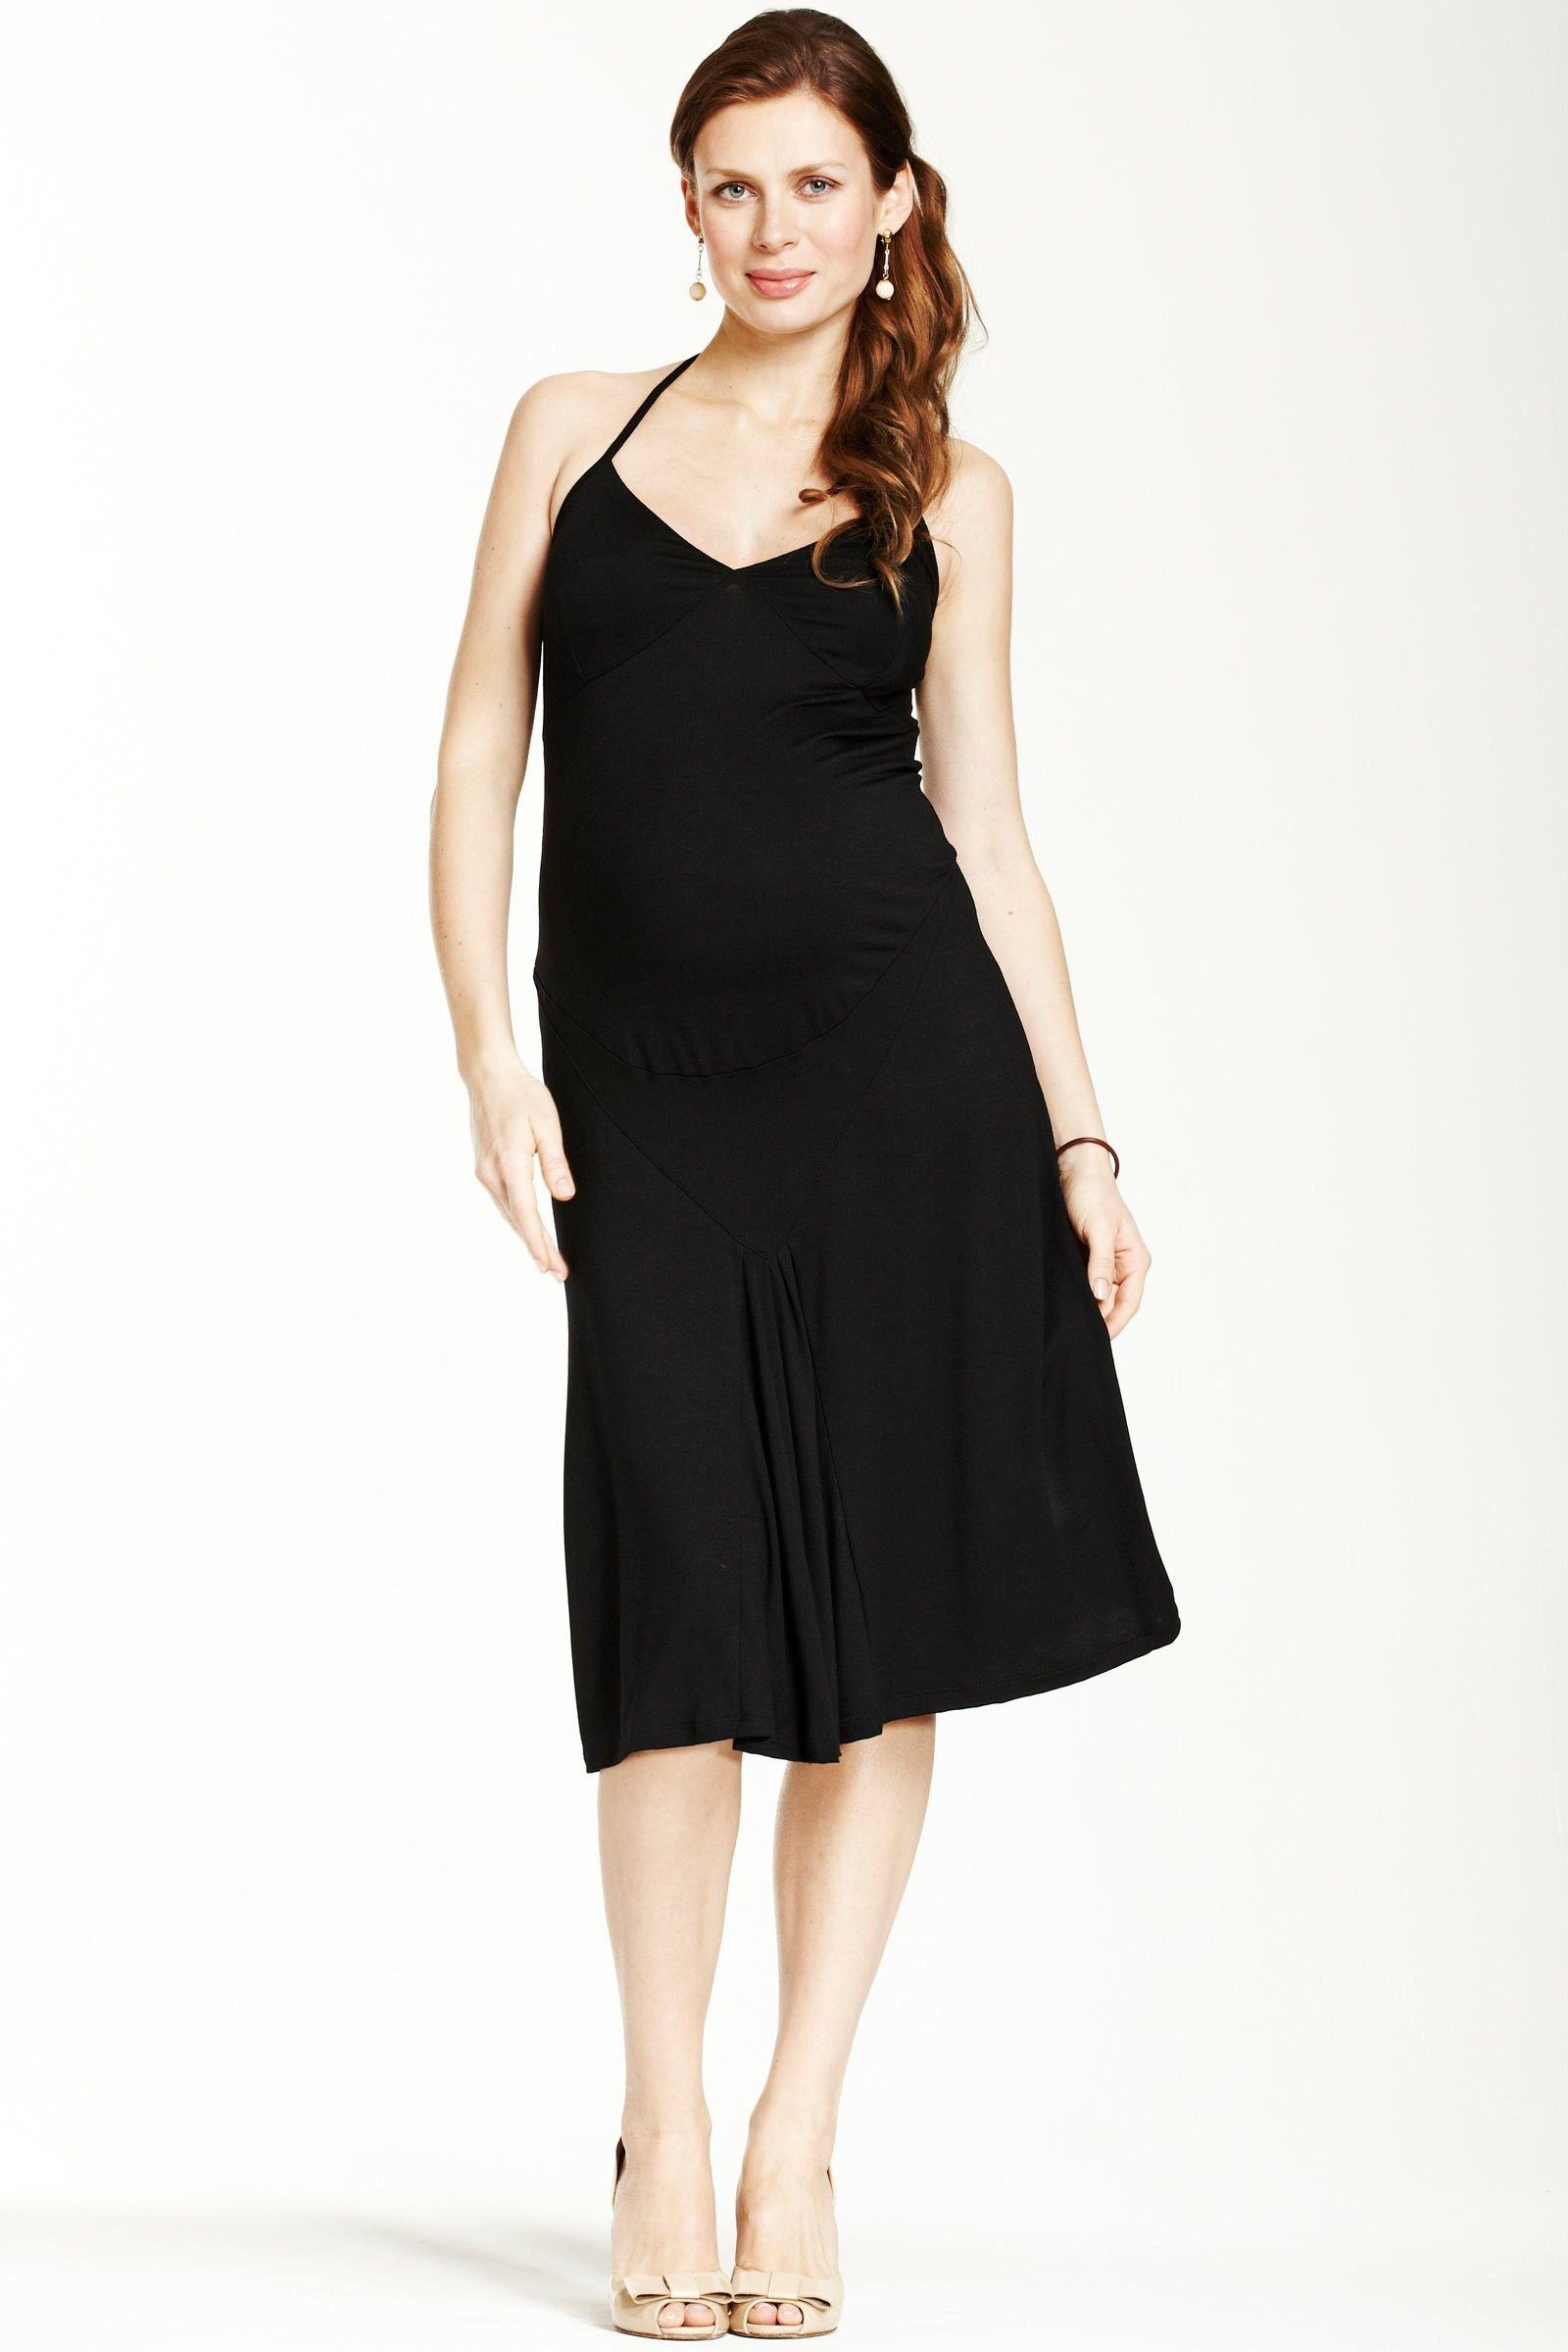 EN SAINTE - Robe grossesse habillée dos nu noire Eva / Black dressy